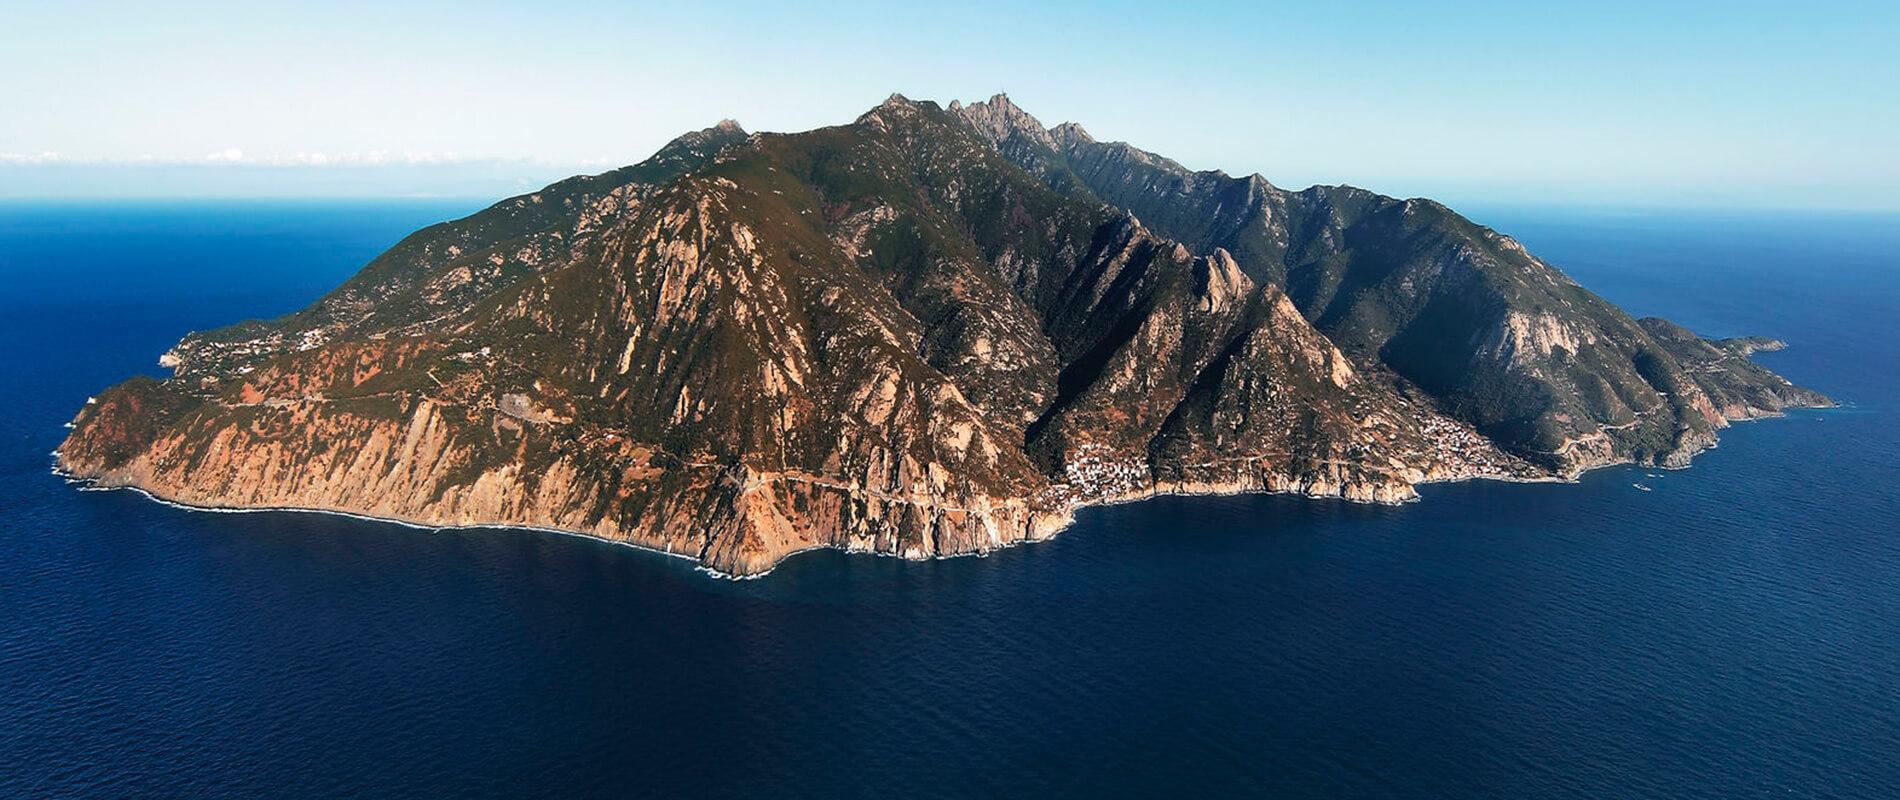 Montecristo Island, the Forbidden Wonder of the Tuscan Archipelago